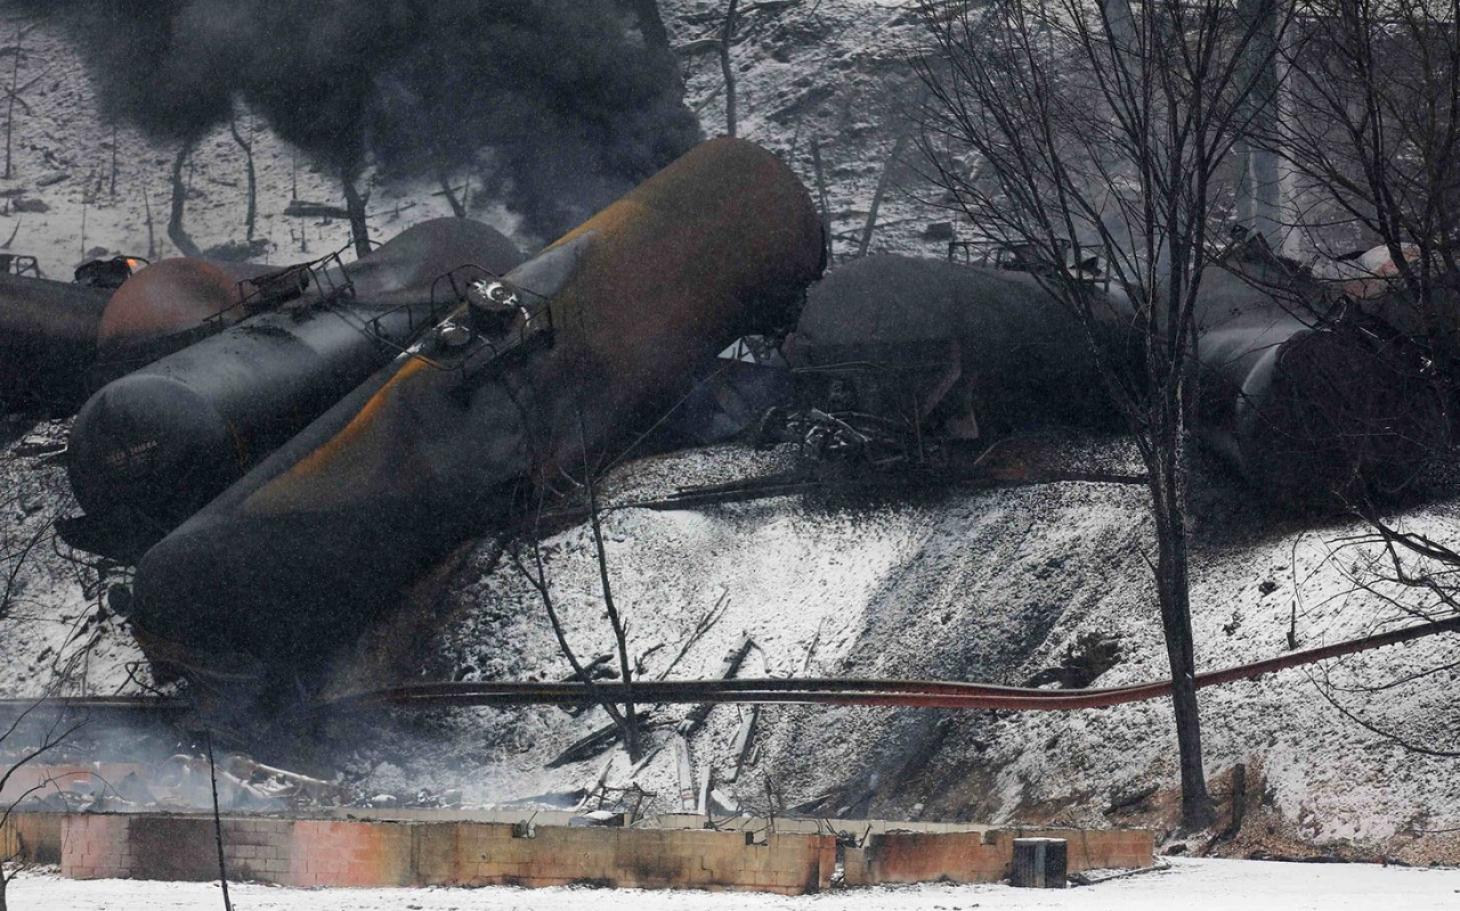 Clean up in West Virginia after oil train crash | Al Jazeera